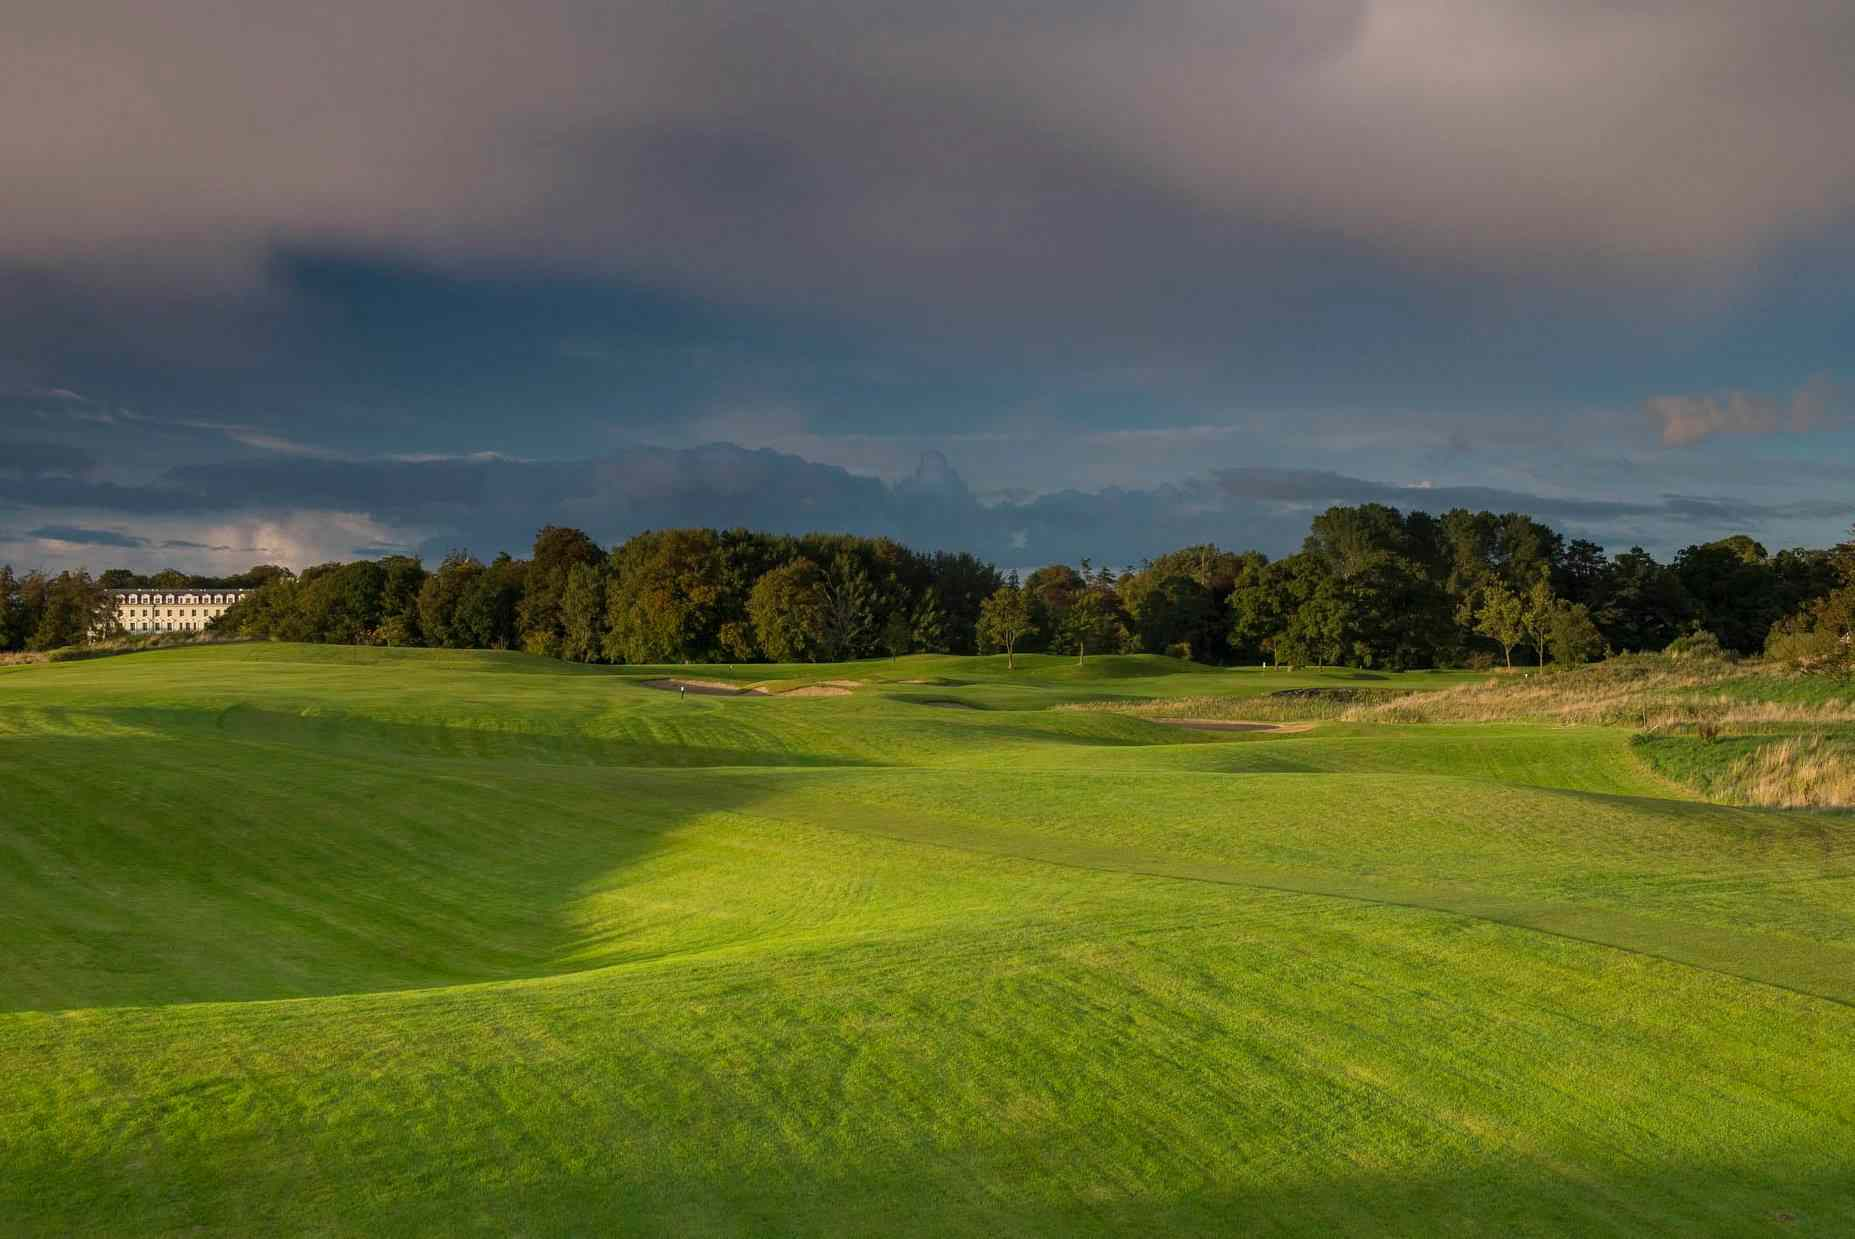 Irish golf course with gray skies